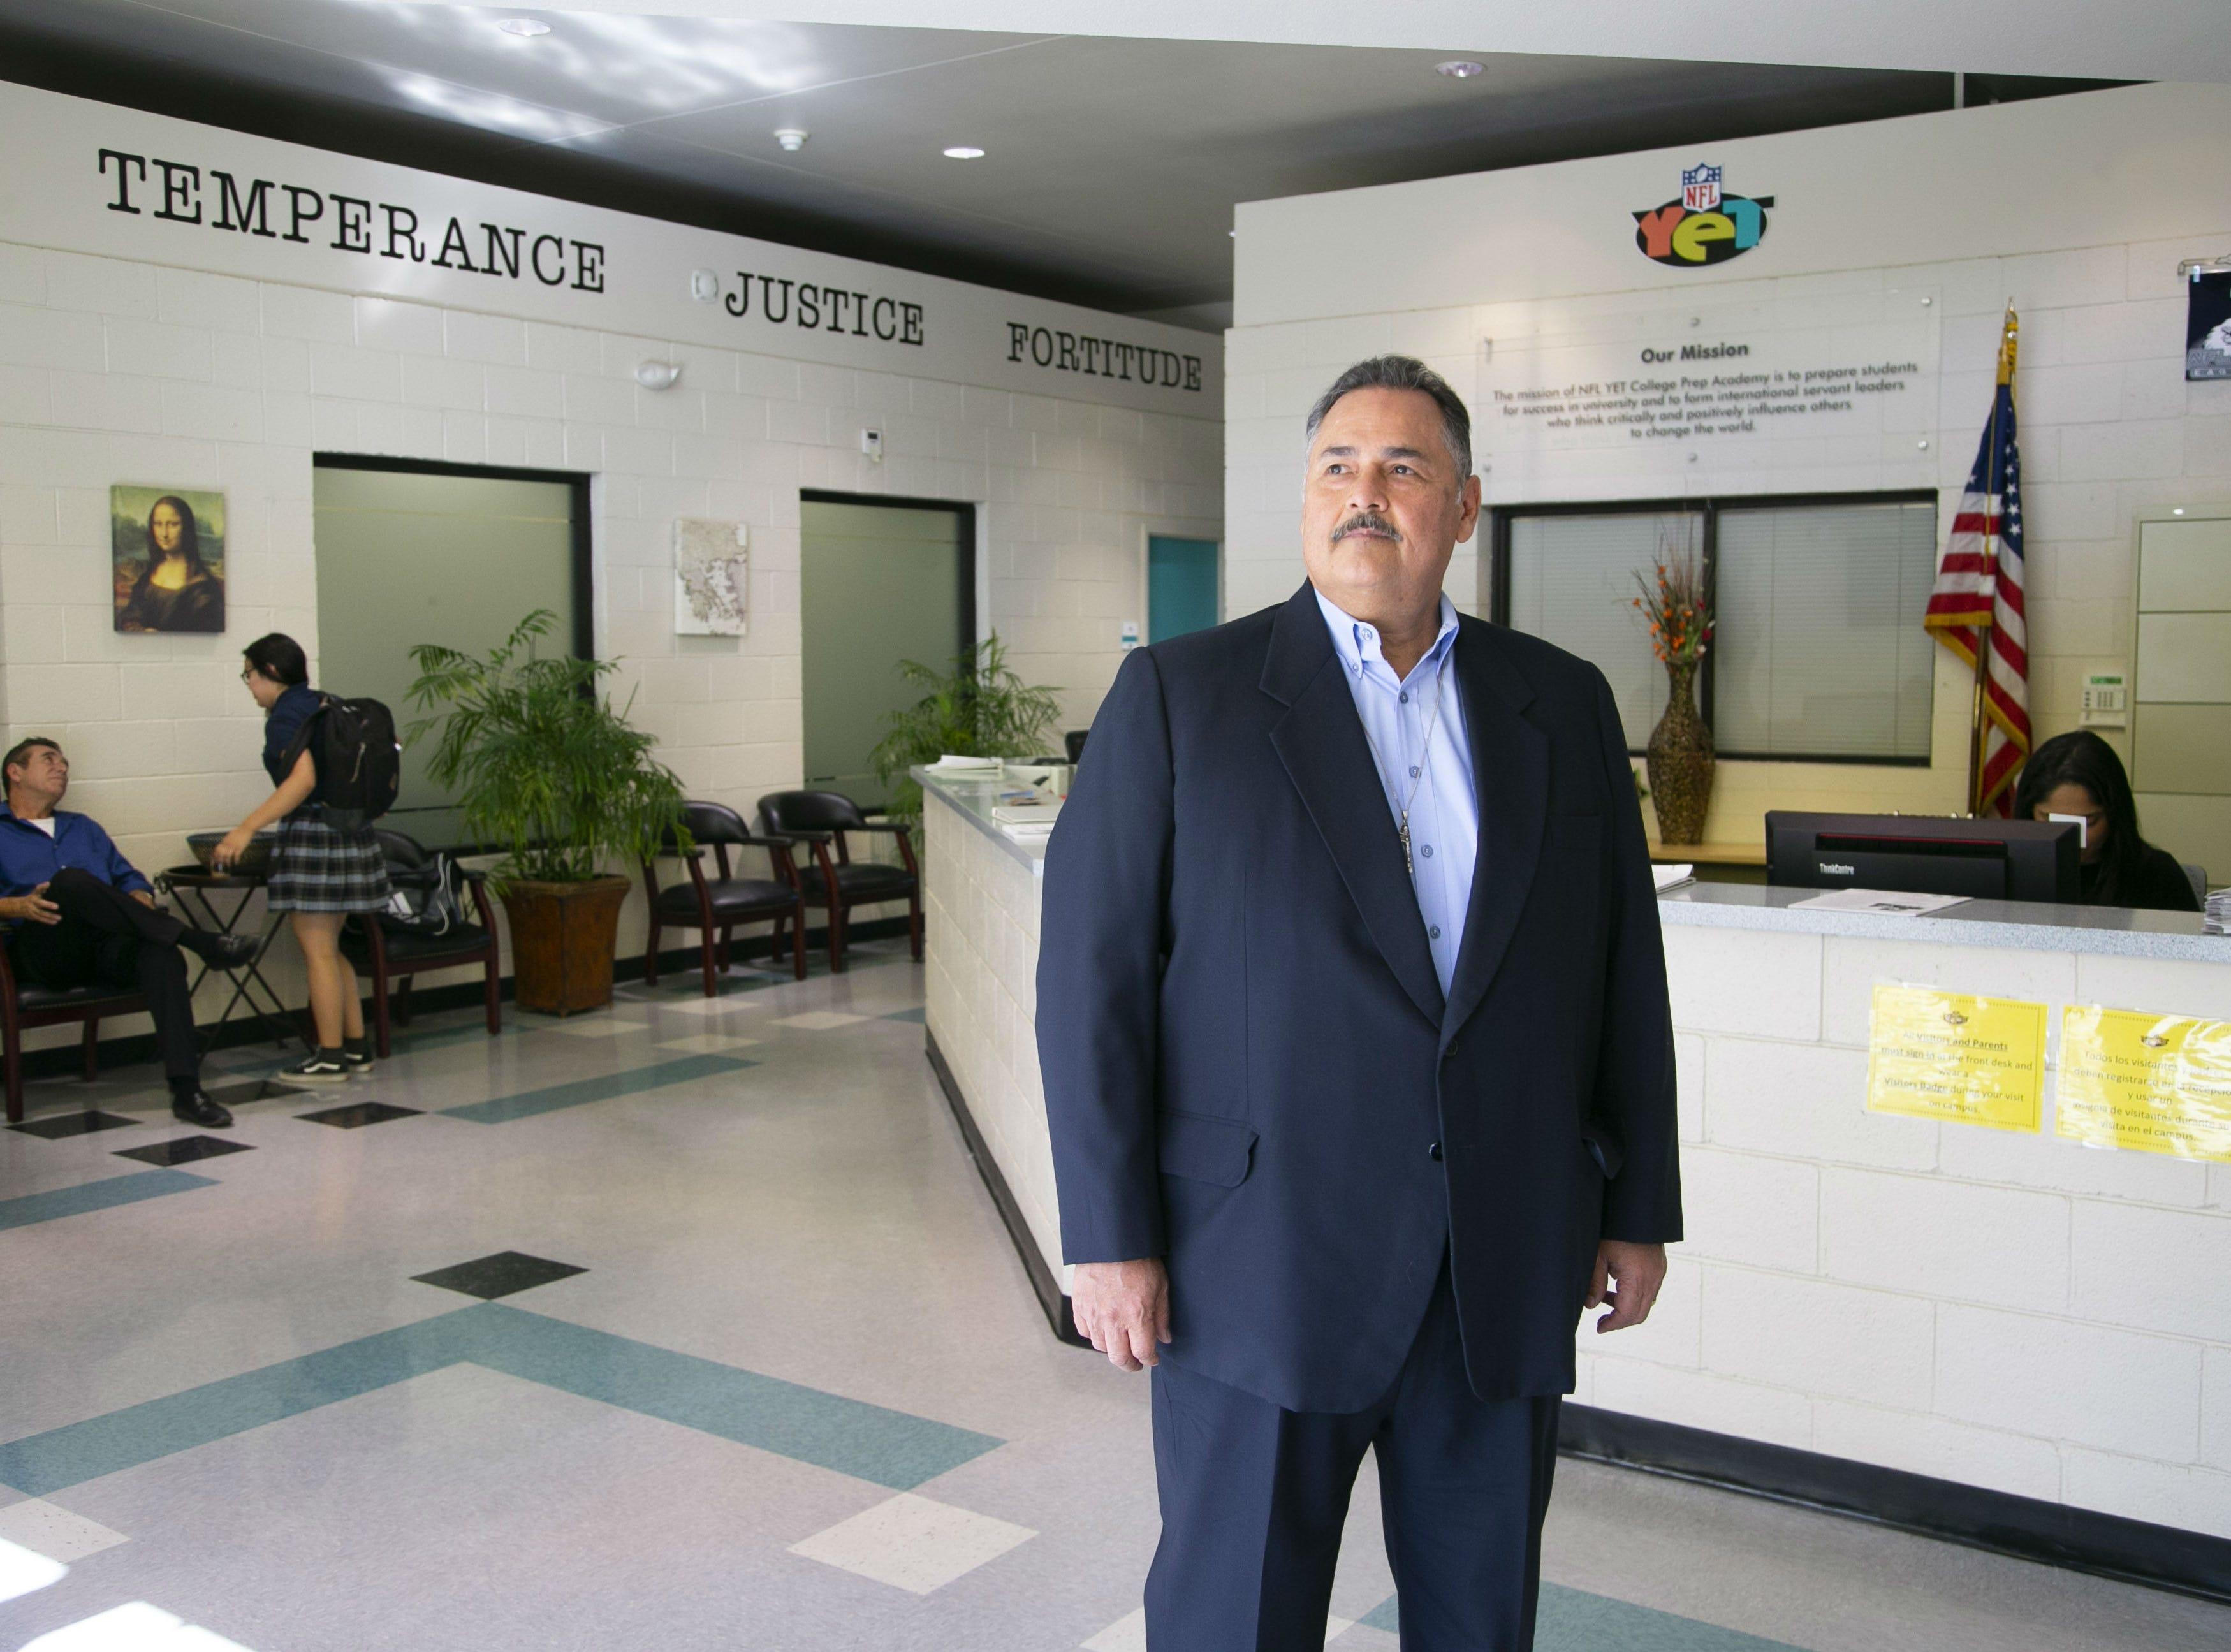 Armando Ruiz, a senior advisor with the Espiritu Community Development Corporation, is pictured at the NFL YET College Prep Academy, a charter school in south Phoenix, on Nov. 5, 2018. Espiritu Community Development Corporation controls several charter schools.